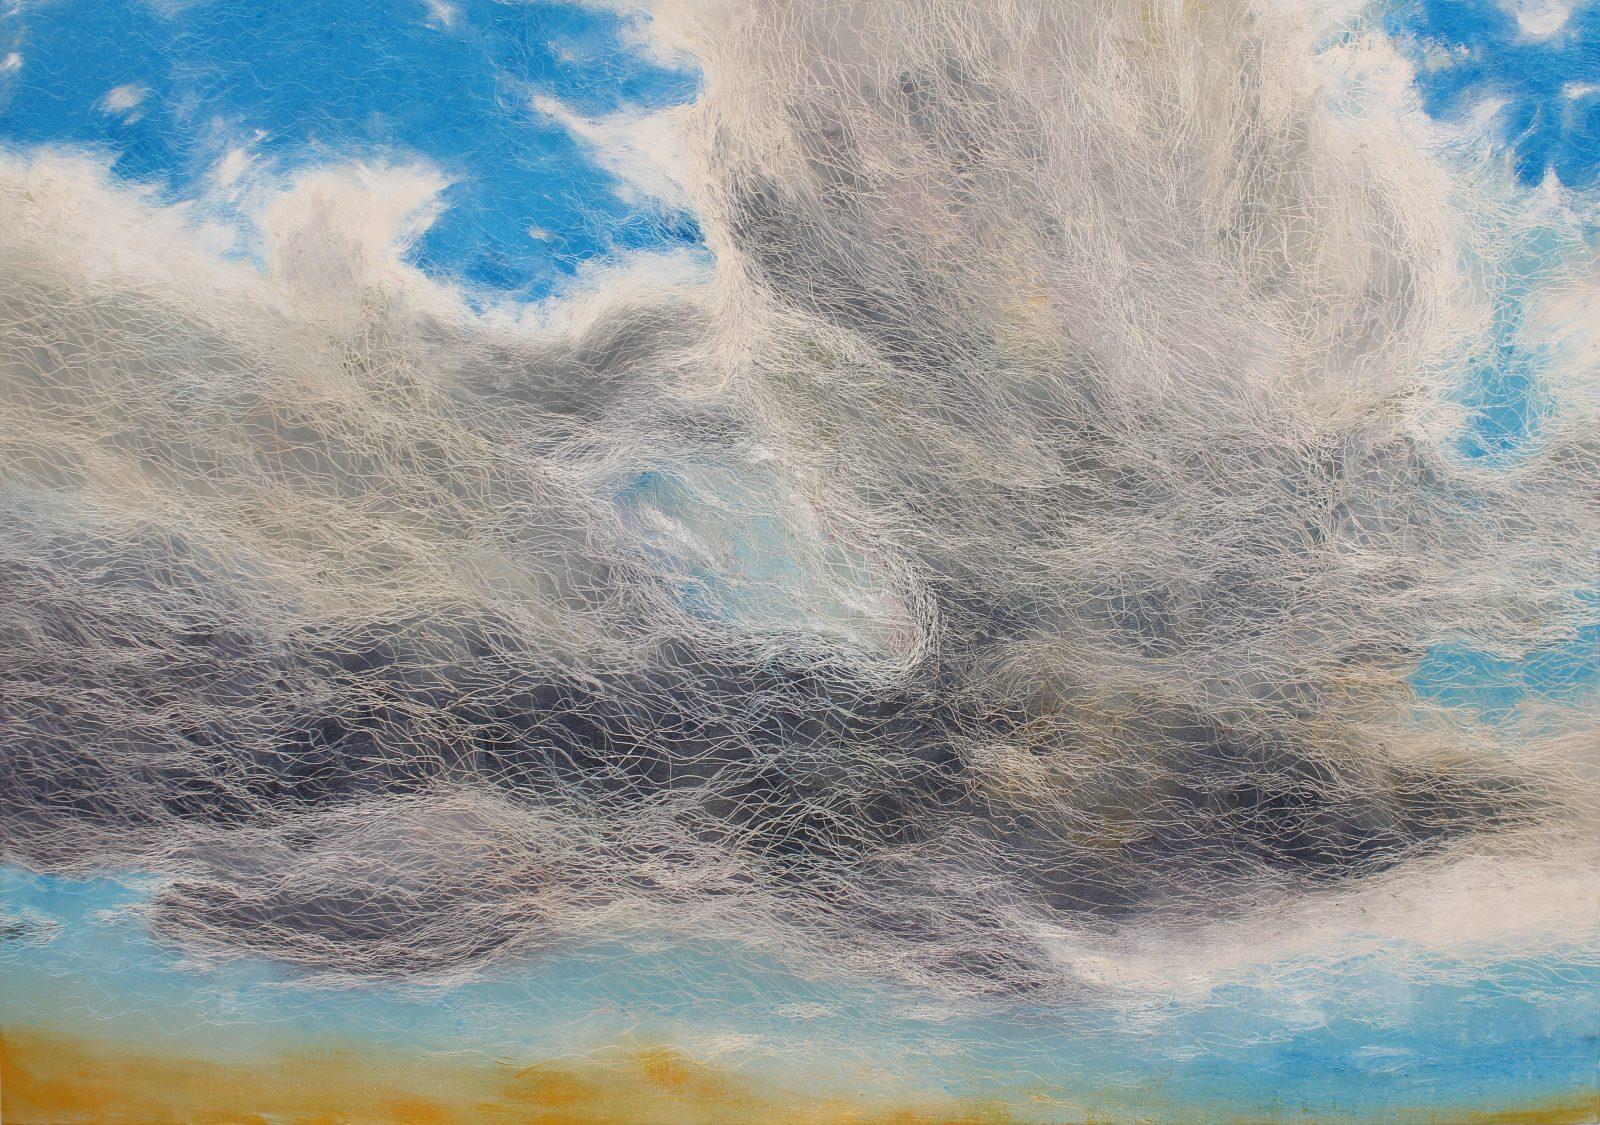 Persian Flight, 42 x 60, oil on canvas, 2013